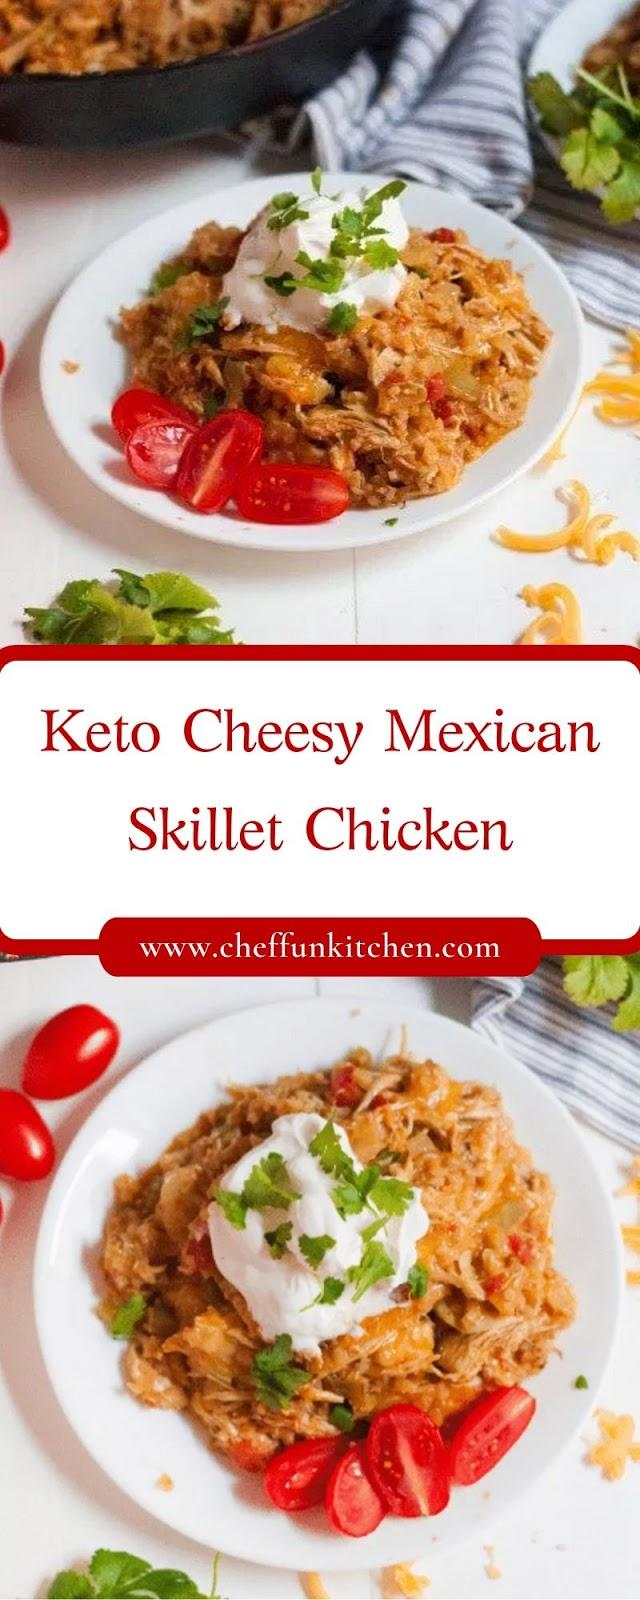 Keto Cheesy Mexican Skillet Chicken